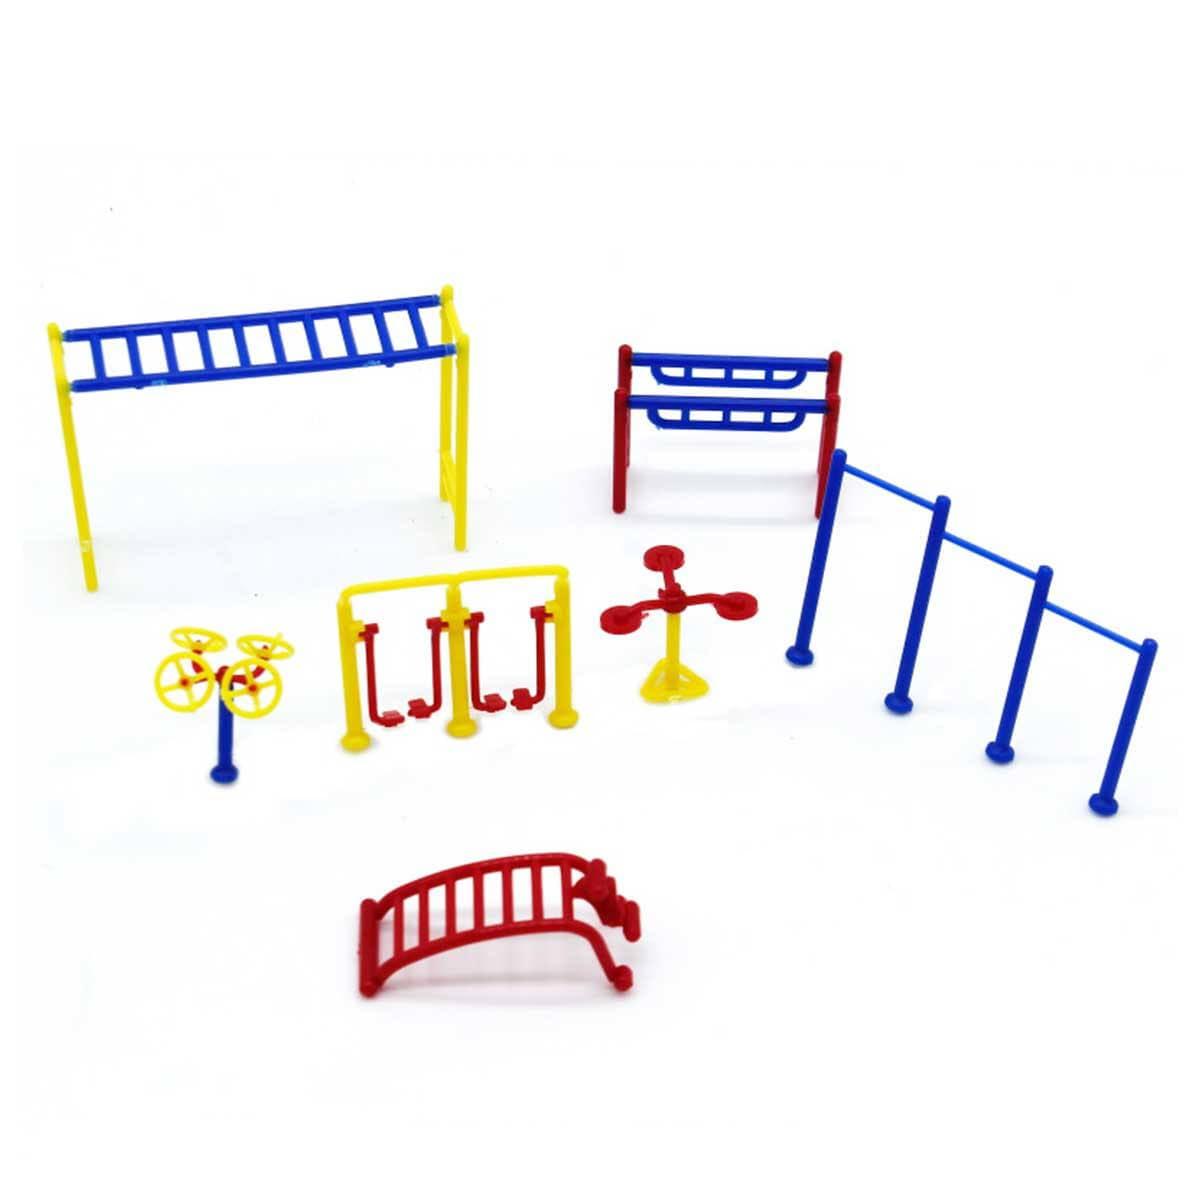 Miniature Fitness Equipment